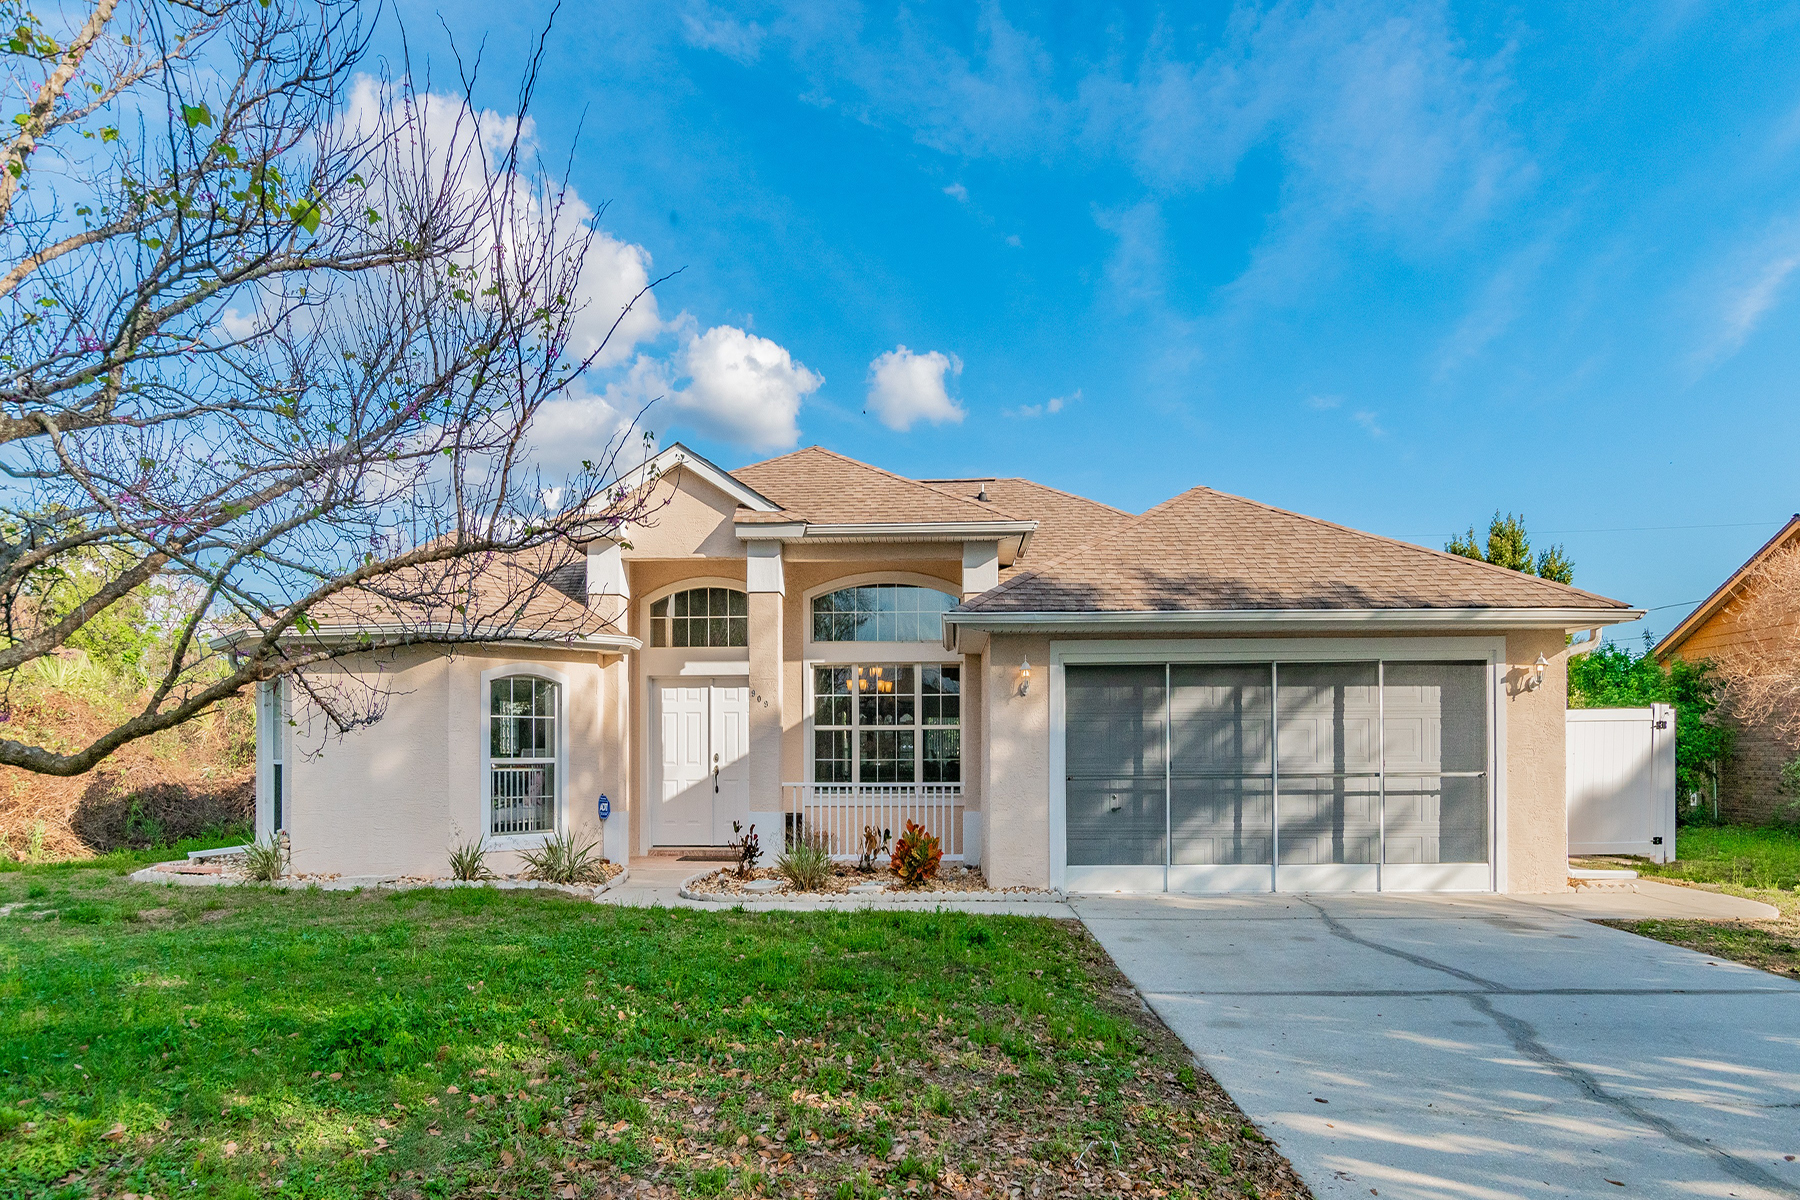 独户住宅 为 销售 在 Deltona 909 Clayton Dr Deltona, 佛罗里达州 32725 美国